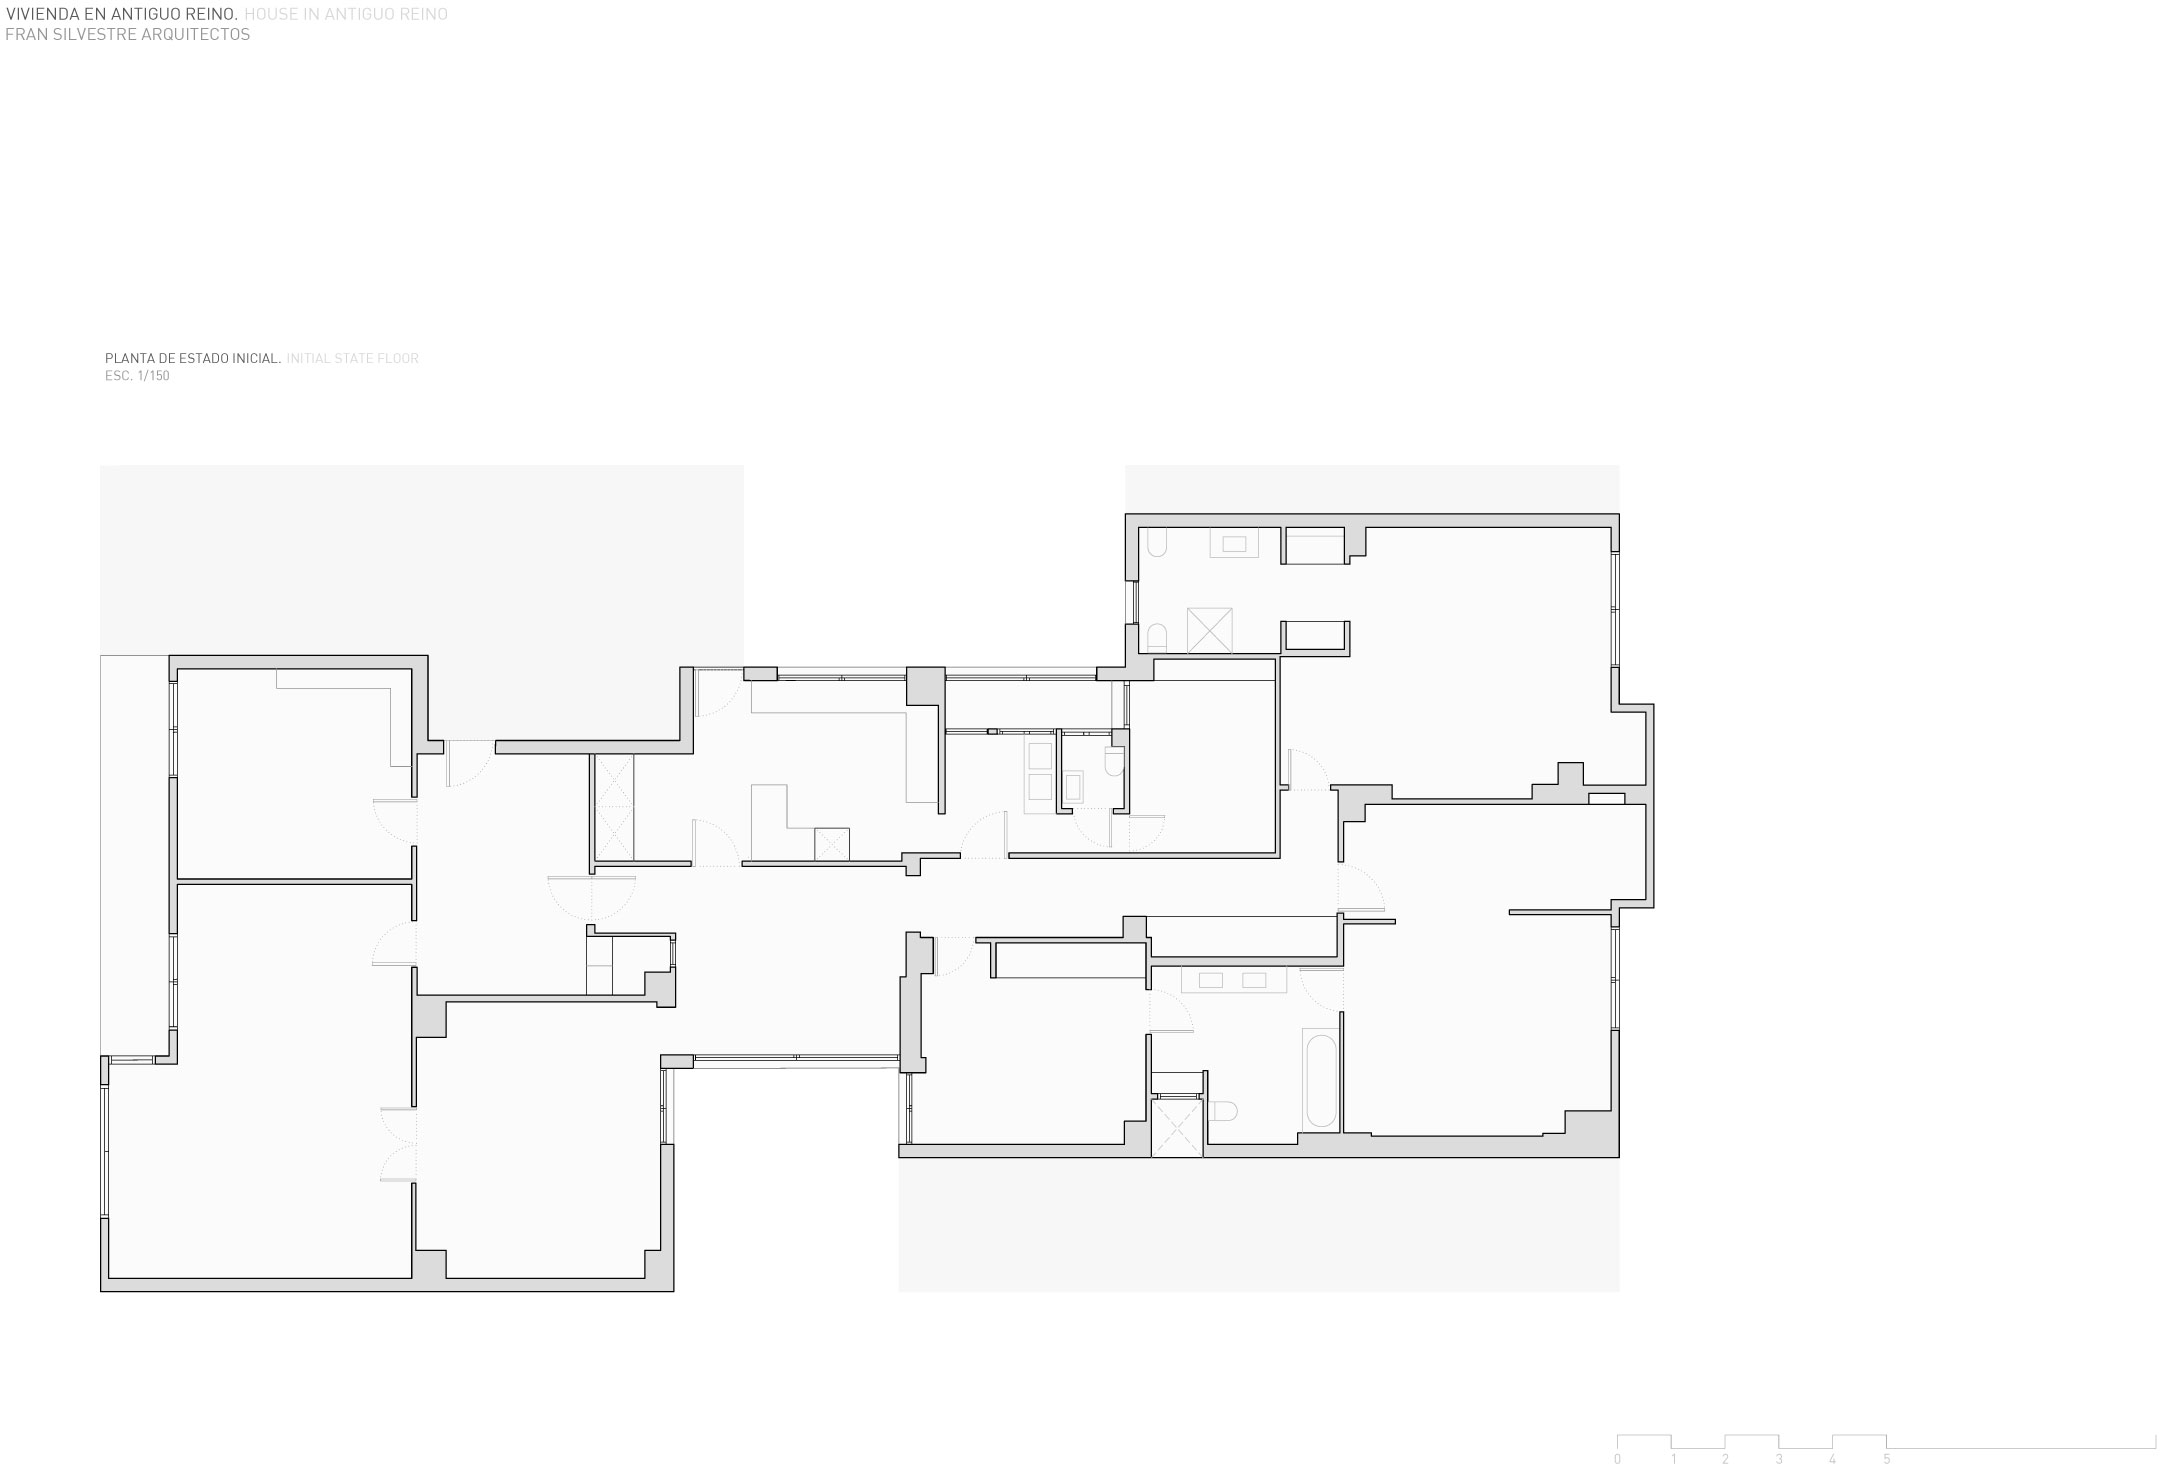 Antiguo-Reino-House-21